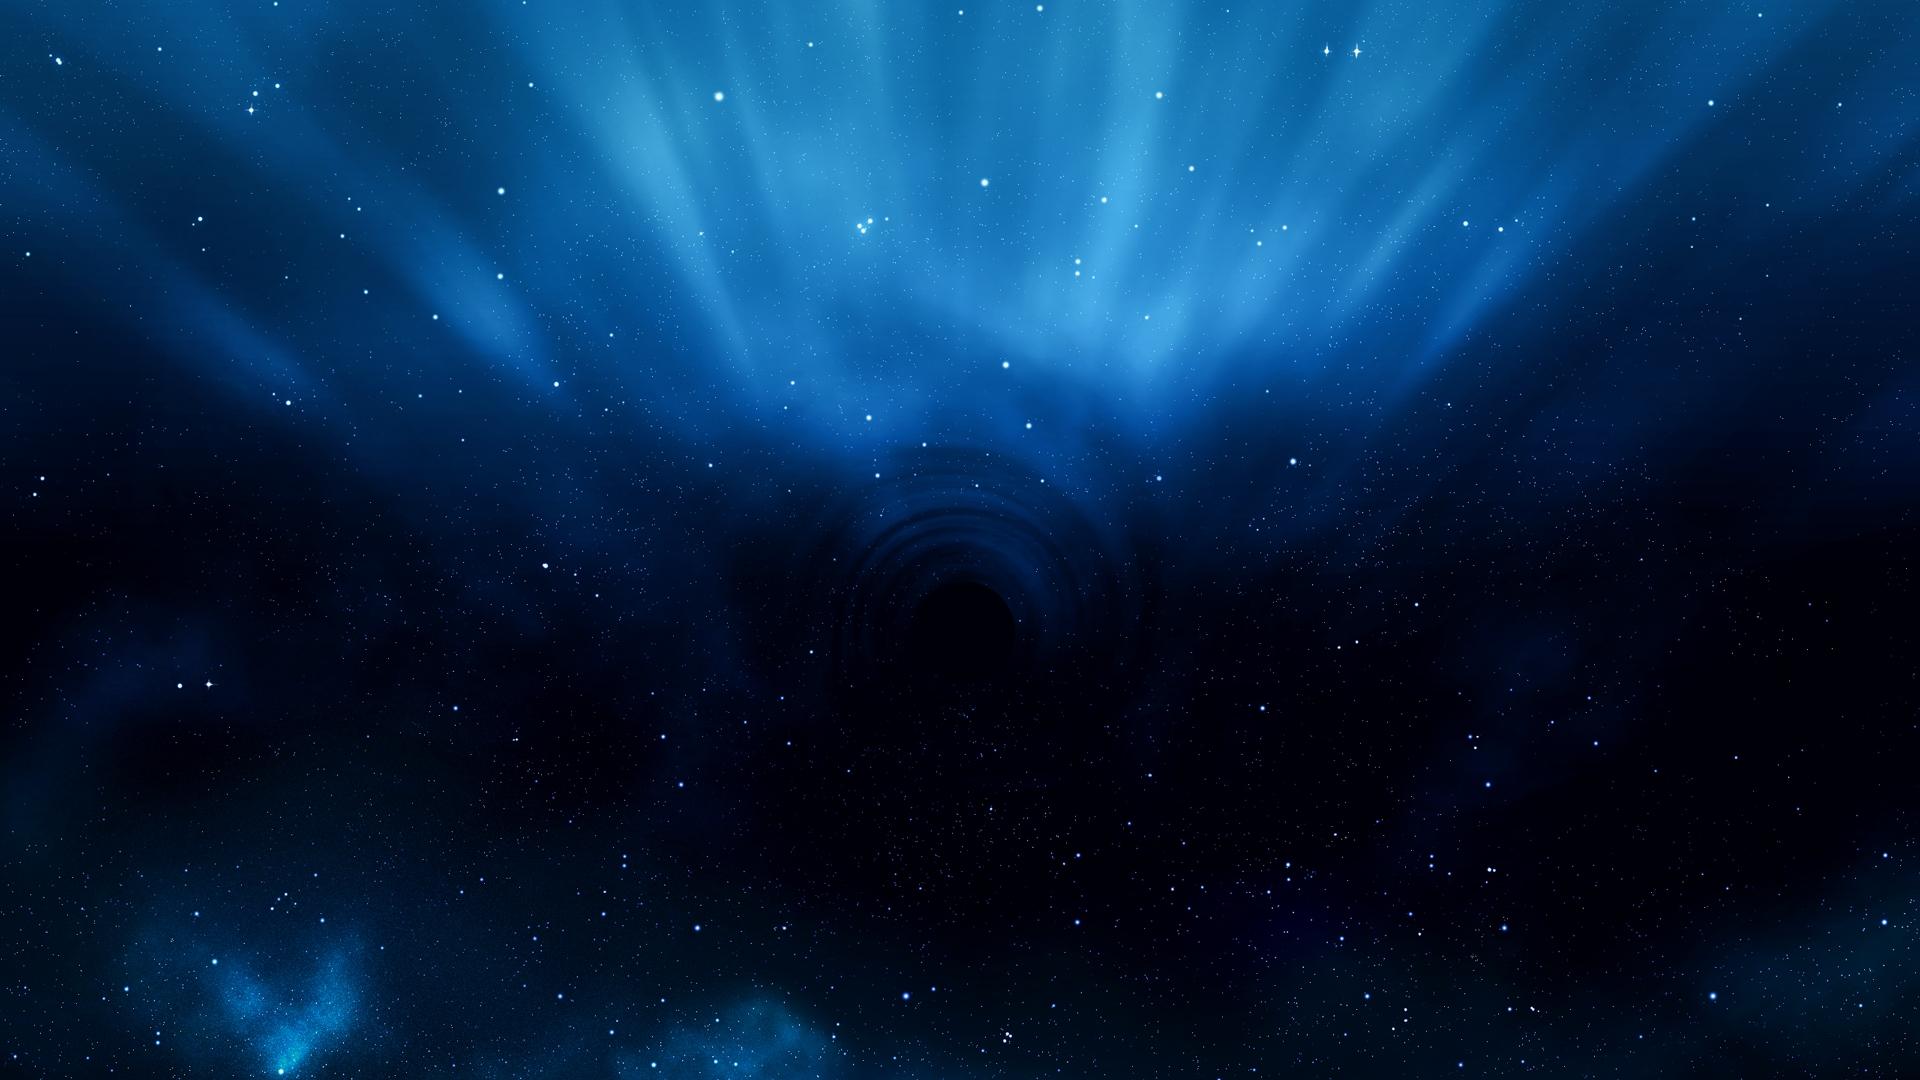 blue space 32331 1920x1080 px hdwallsource